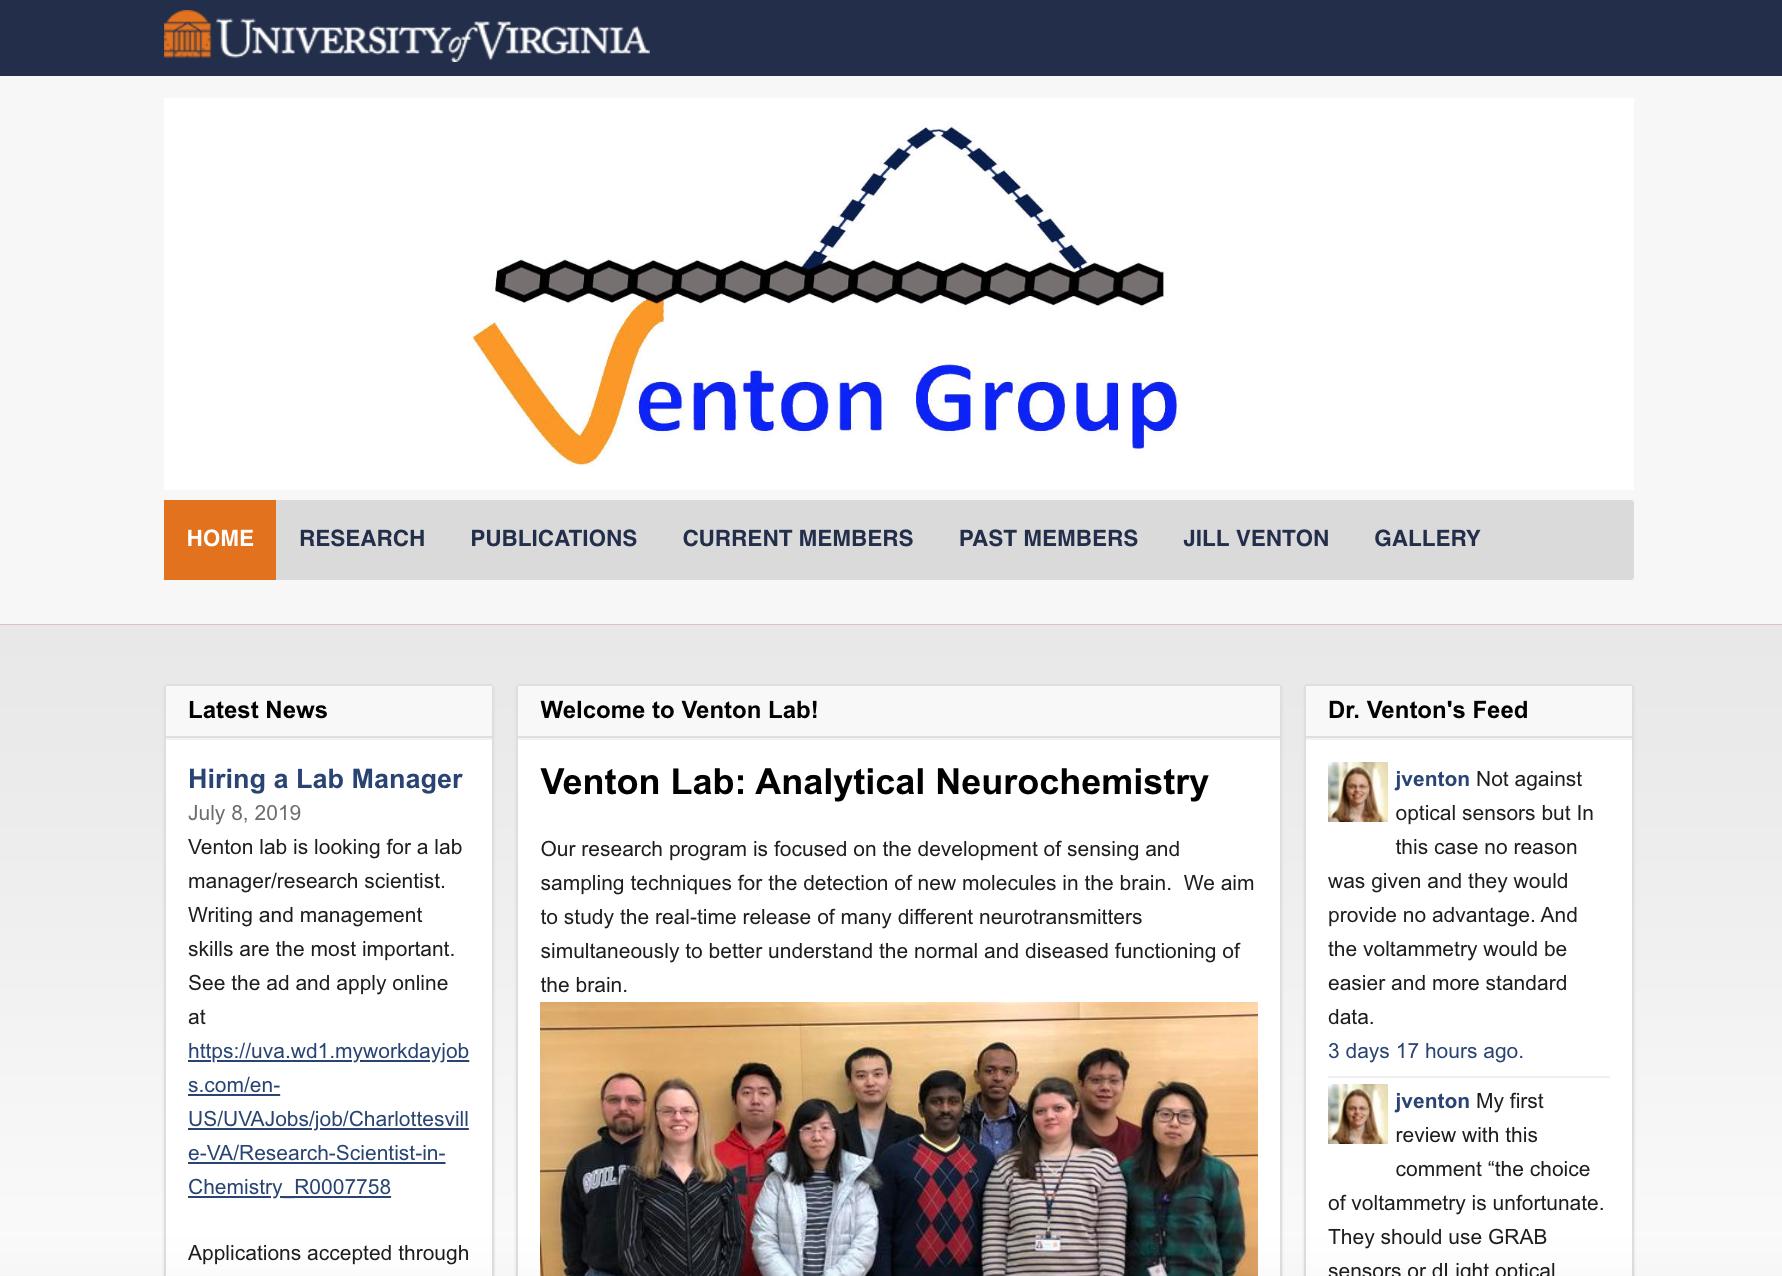 Venton Group website example